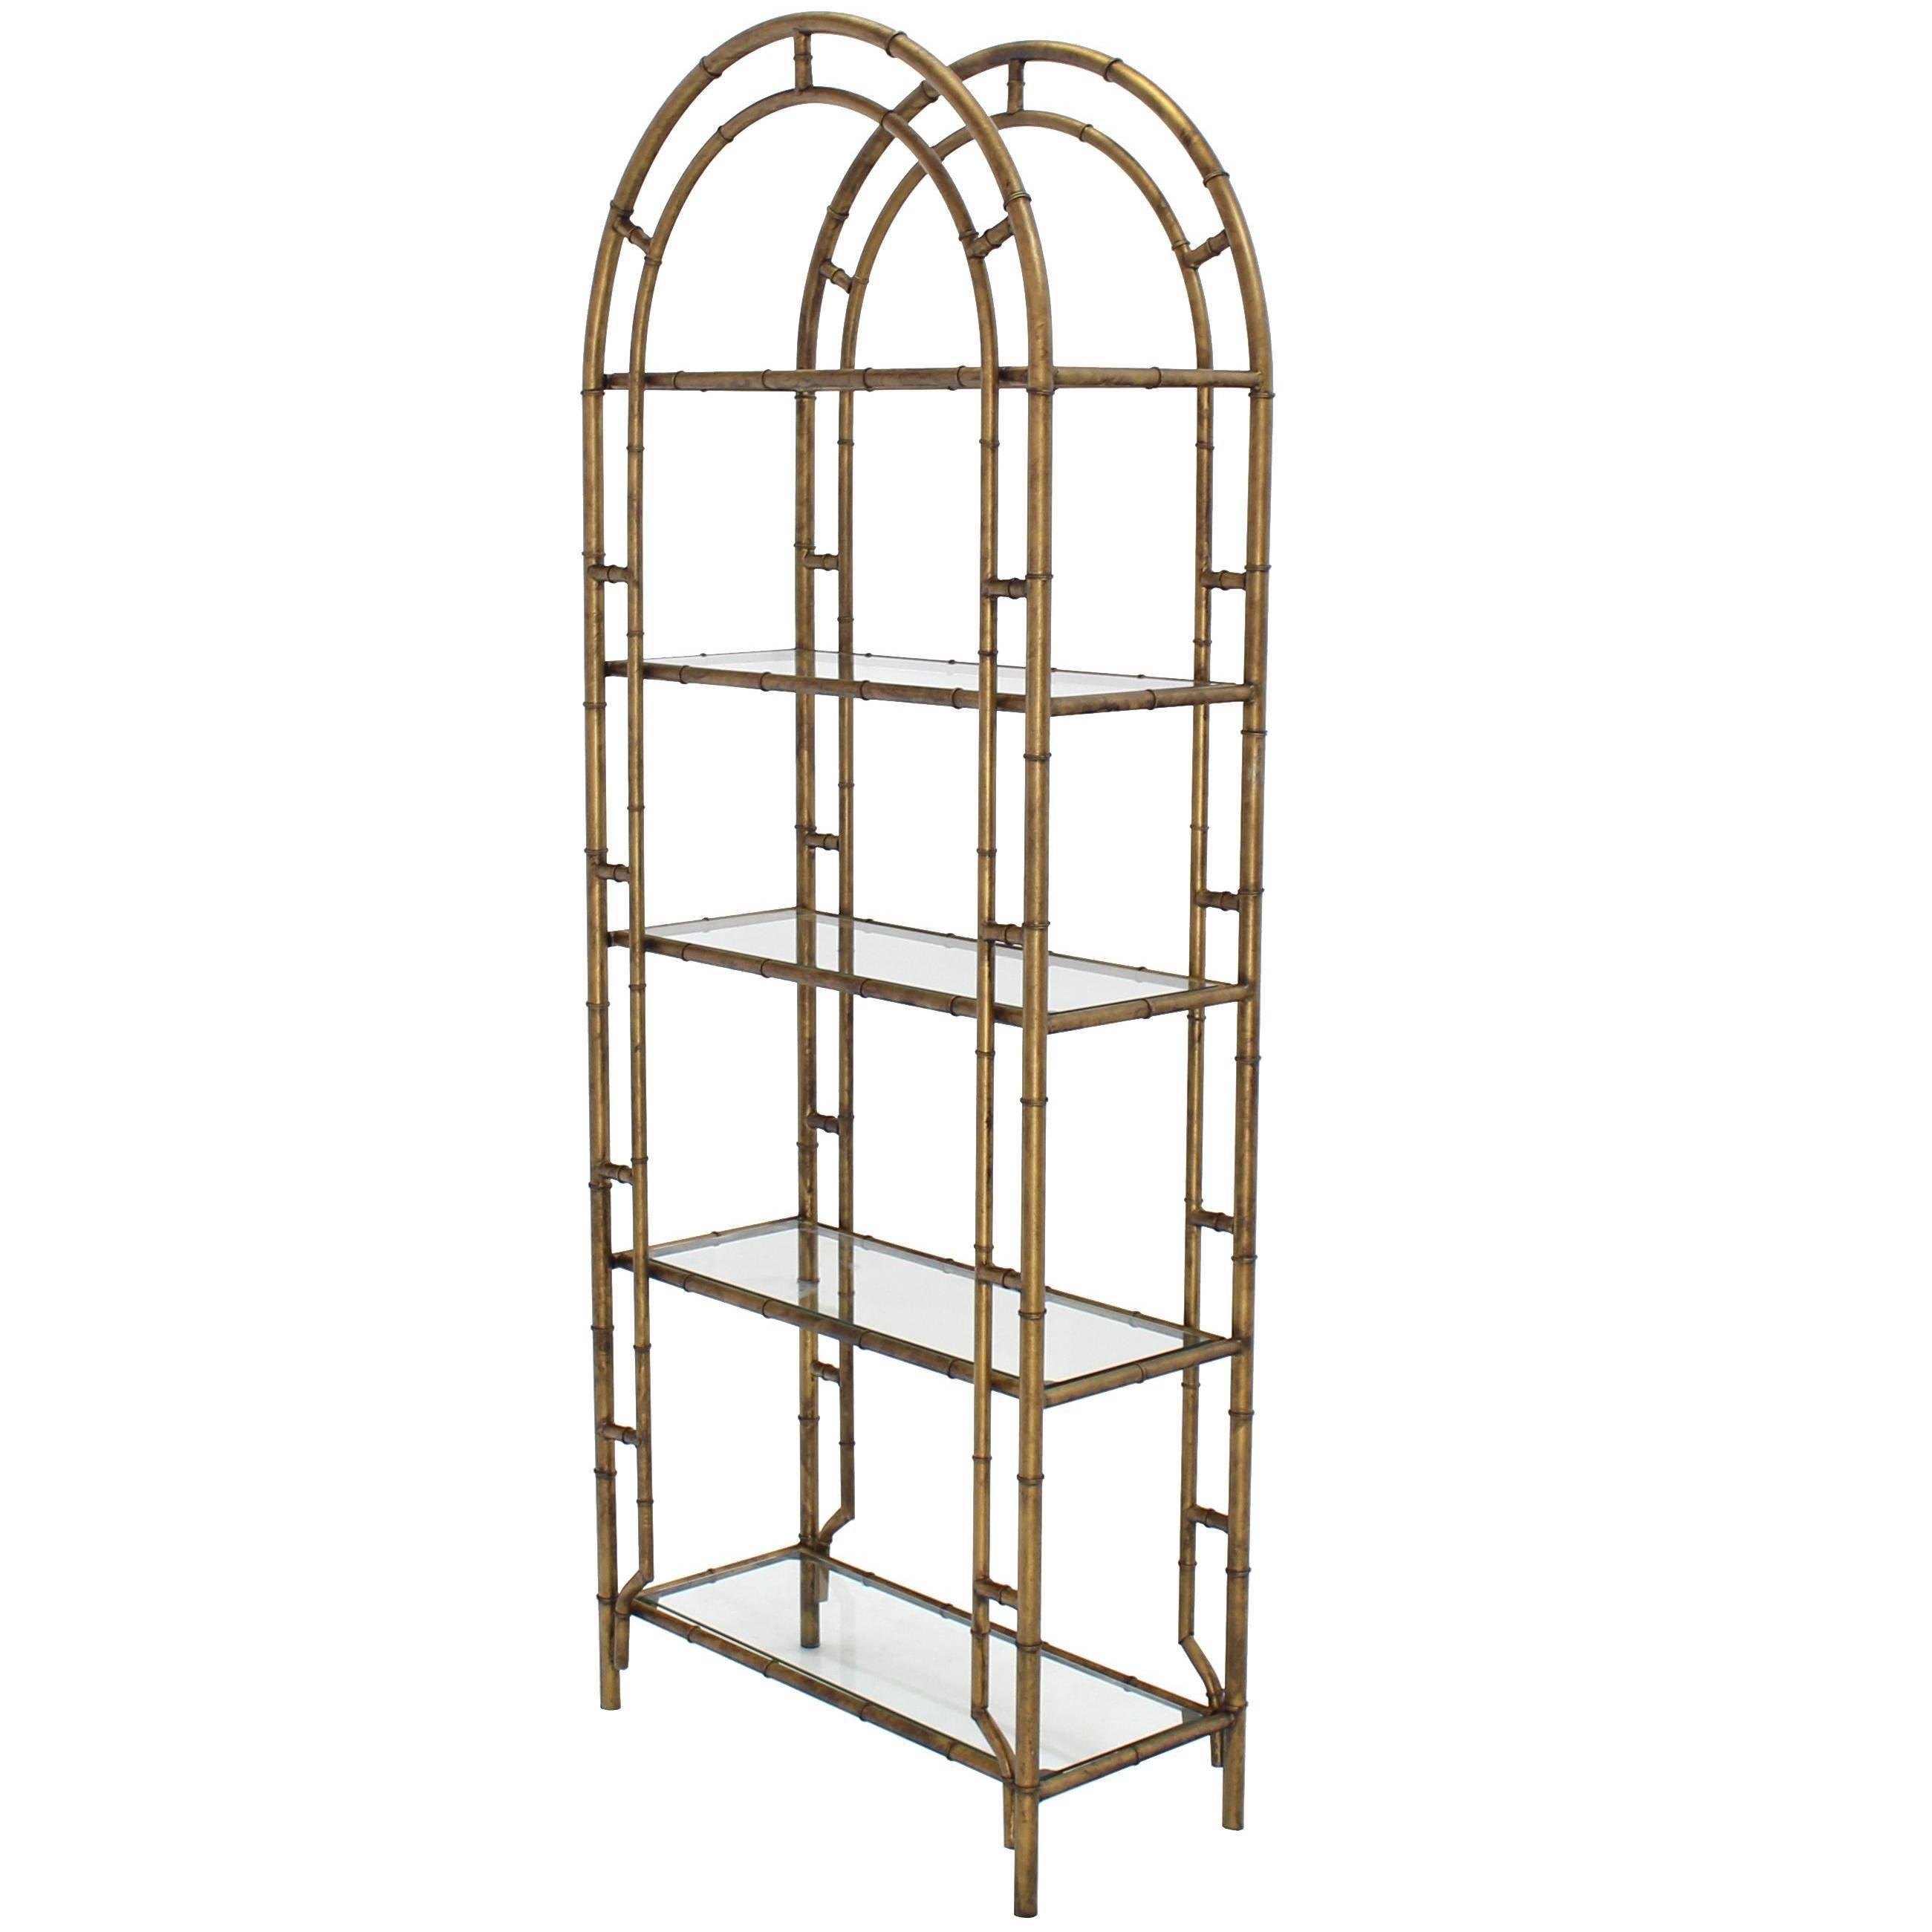 Faux Bamboo Arch Shape Glass Shelves Etagere